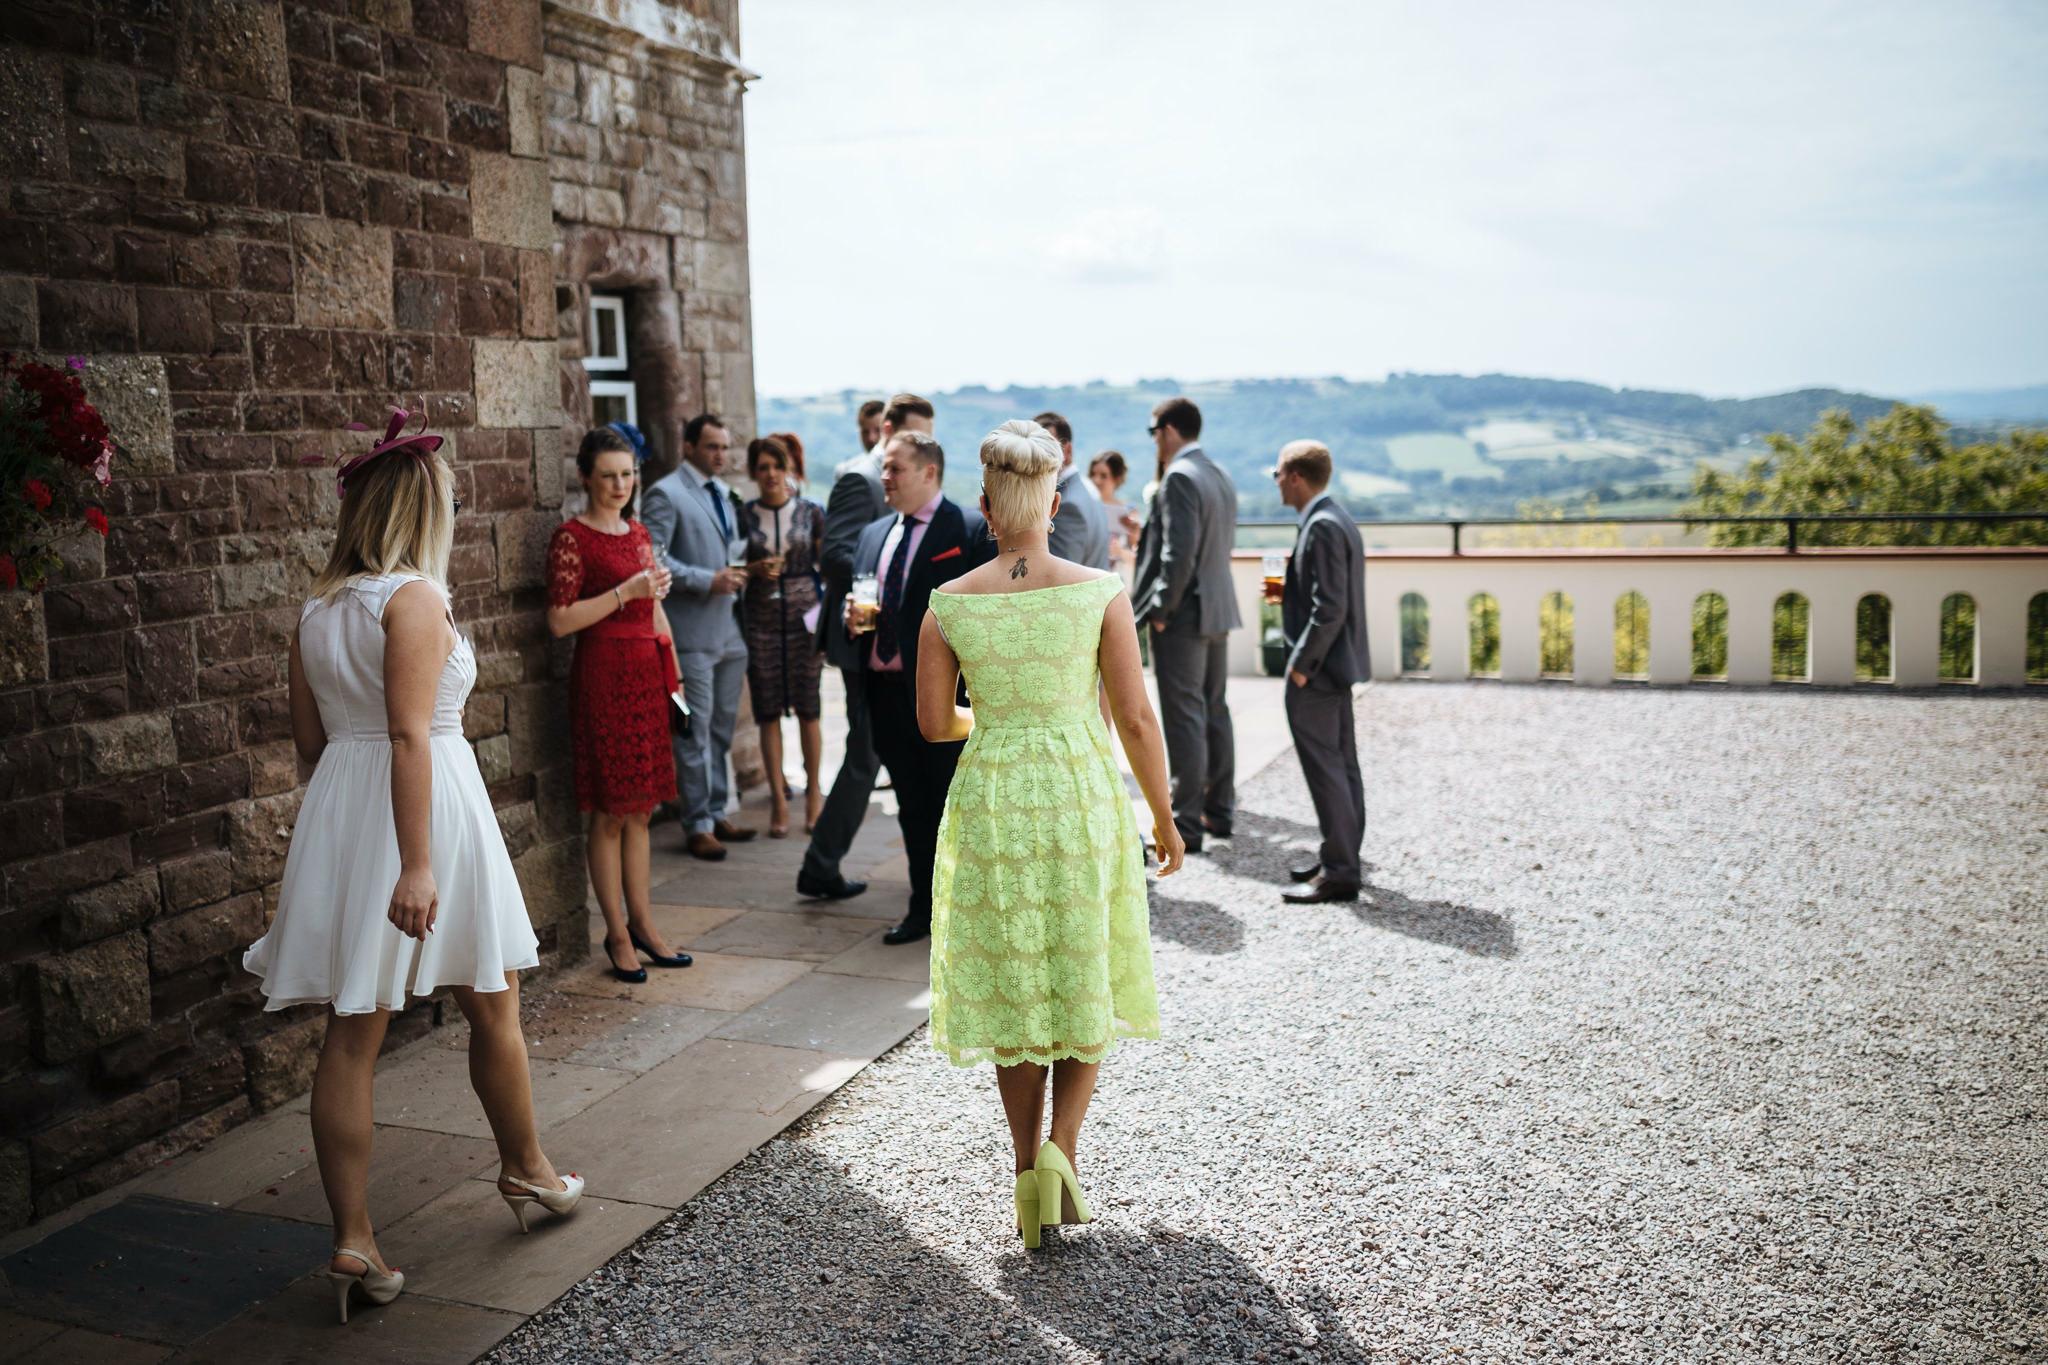 paul-marbrook-Caer-Llan-Wedding-Photographer-90033